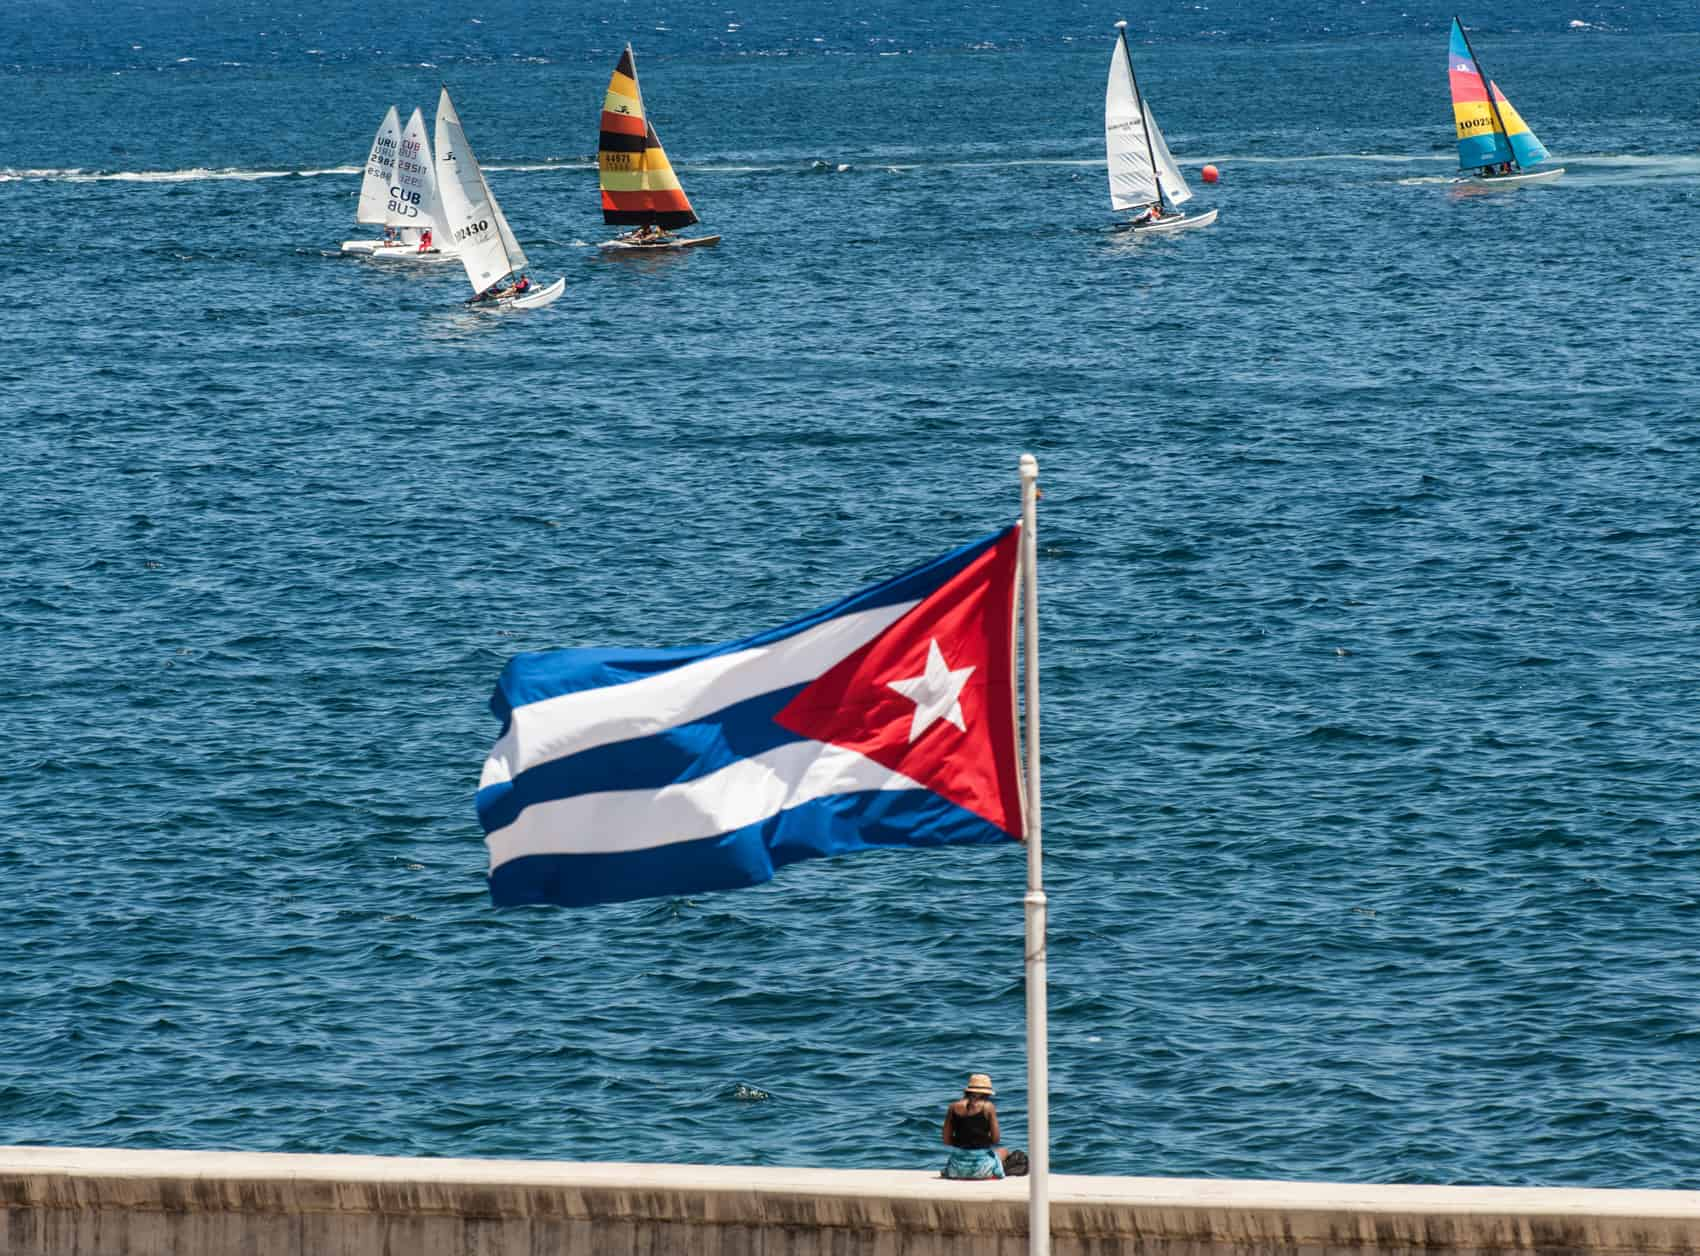 A Cuban national flag flutters as participants of the Havana Challenge regatta compete in Havana.